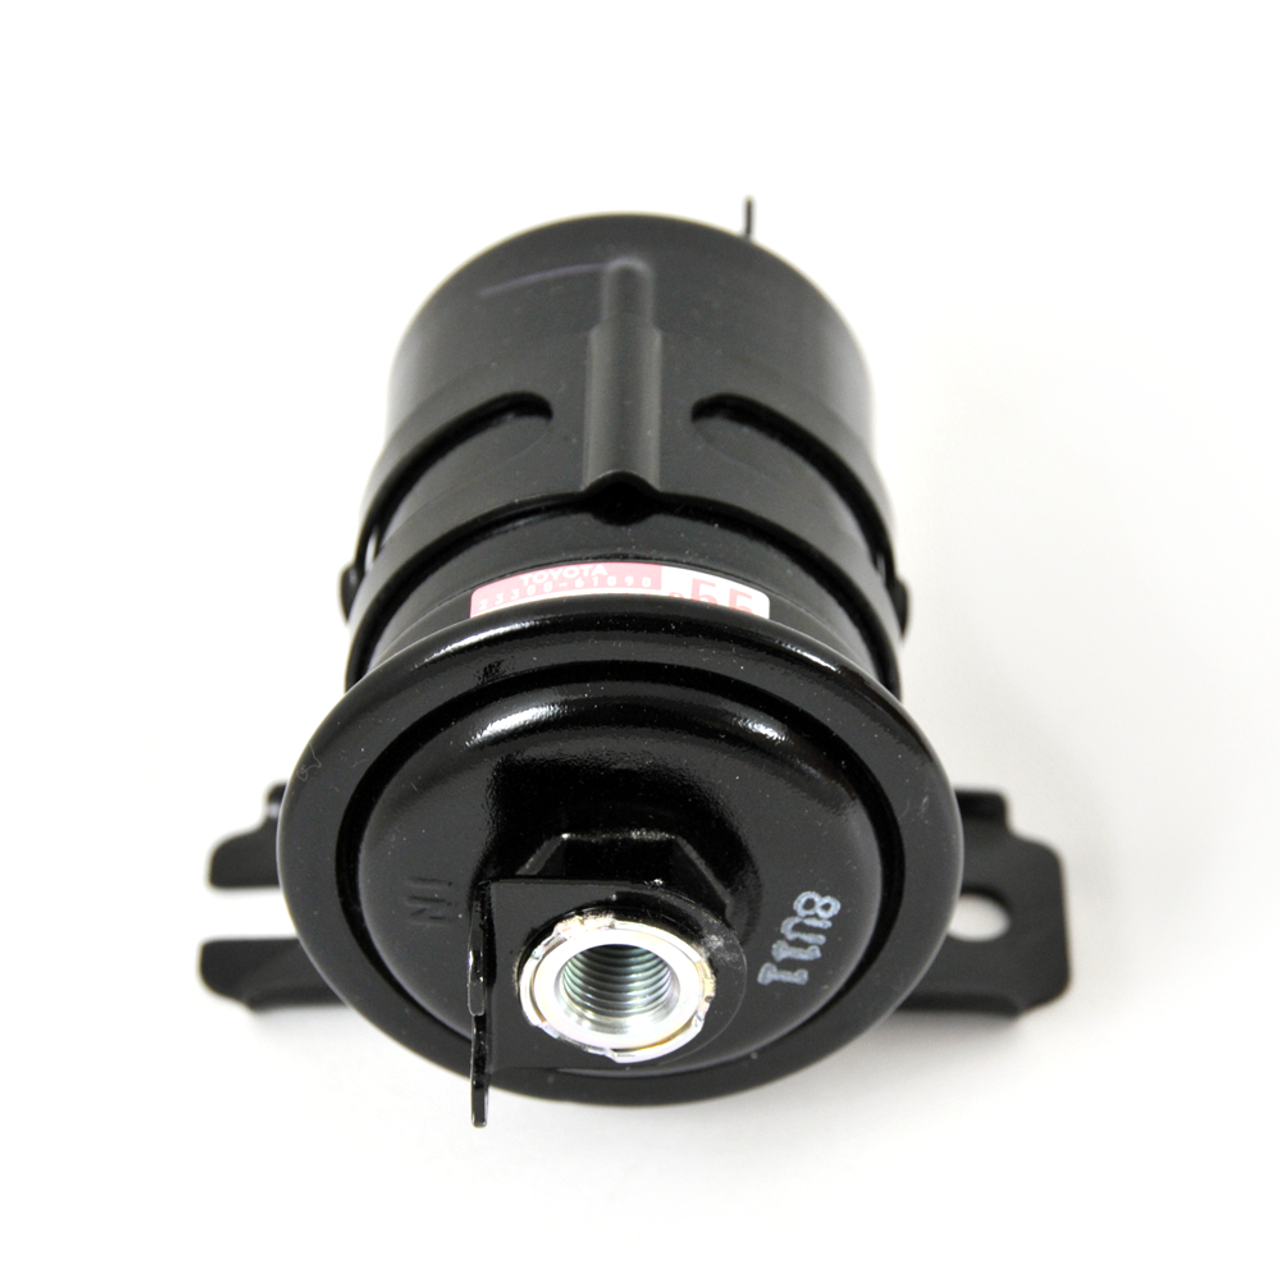 80 Series Land Cruiser 3FE Fuel Filter (TFF-5)